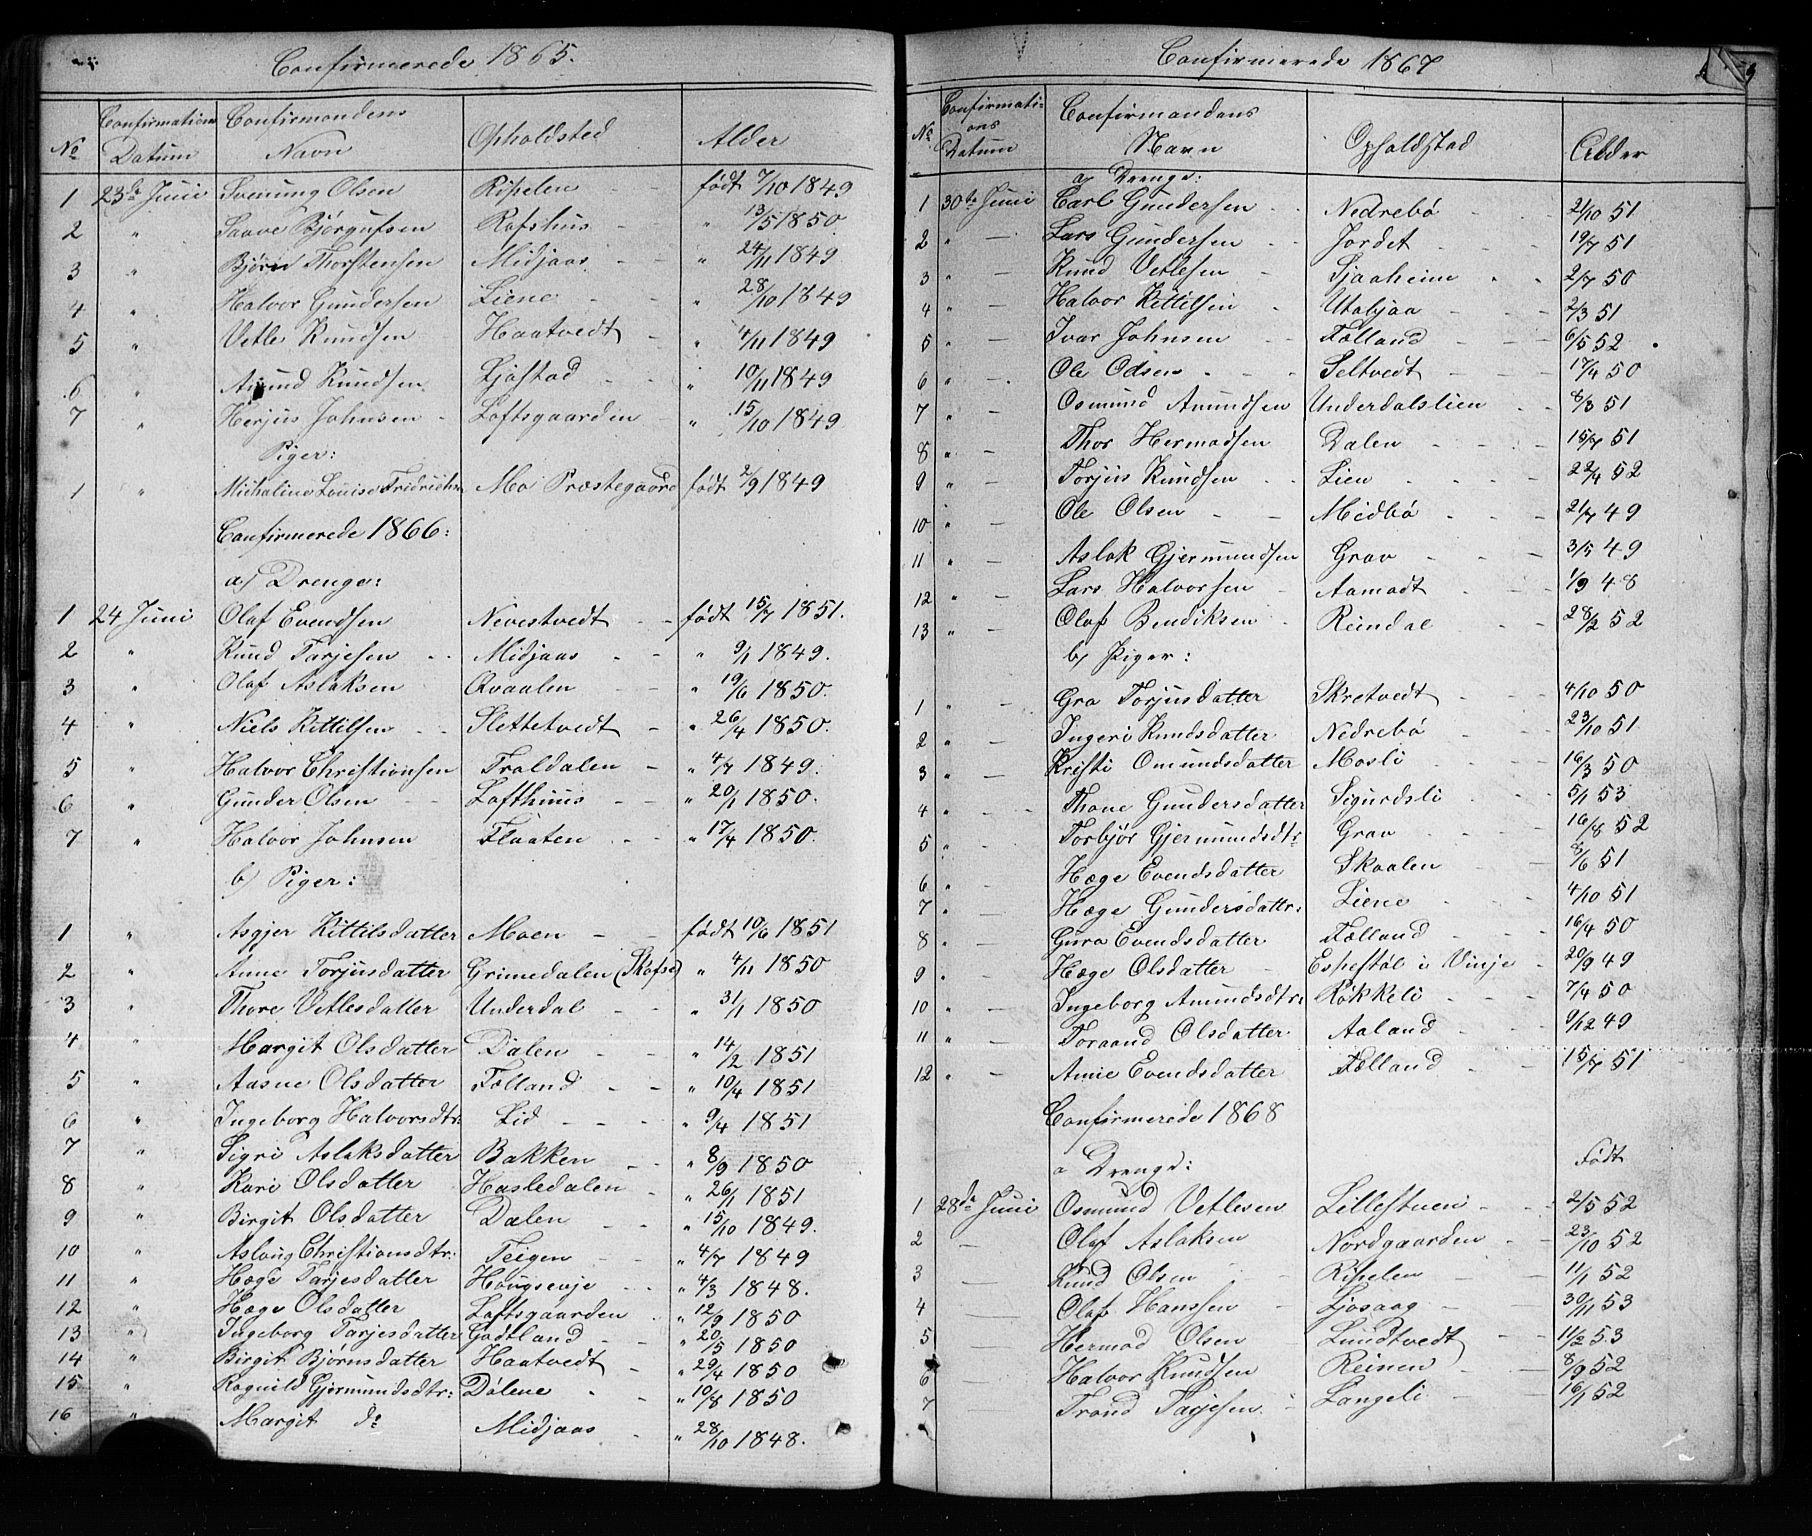 SAKO, Mo kirkebøker, G/Ga/L0001: Klokkerbok nr. I 1, 1851-1891, s. 46